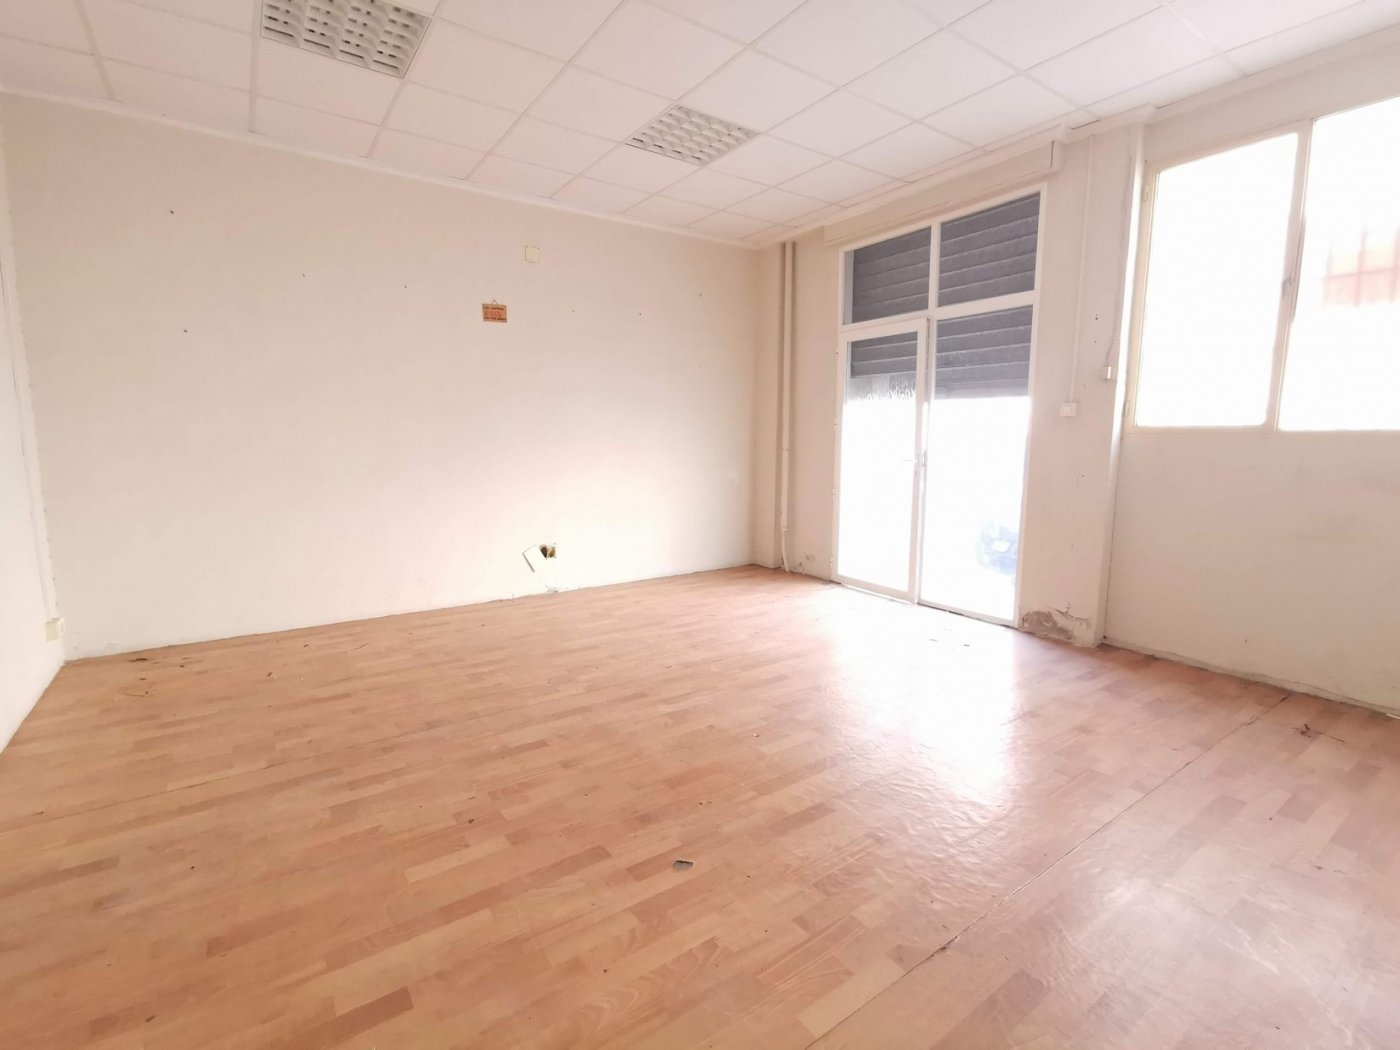 Premises for rent in Plaza Madrid, Elche